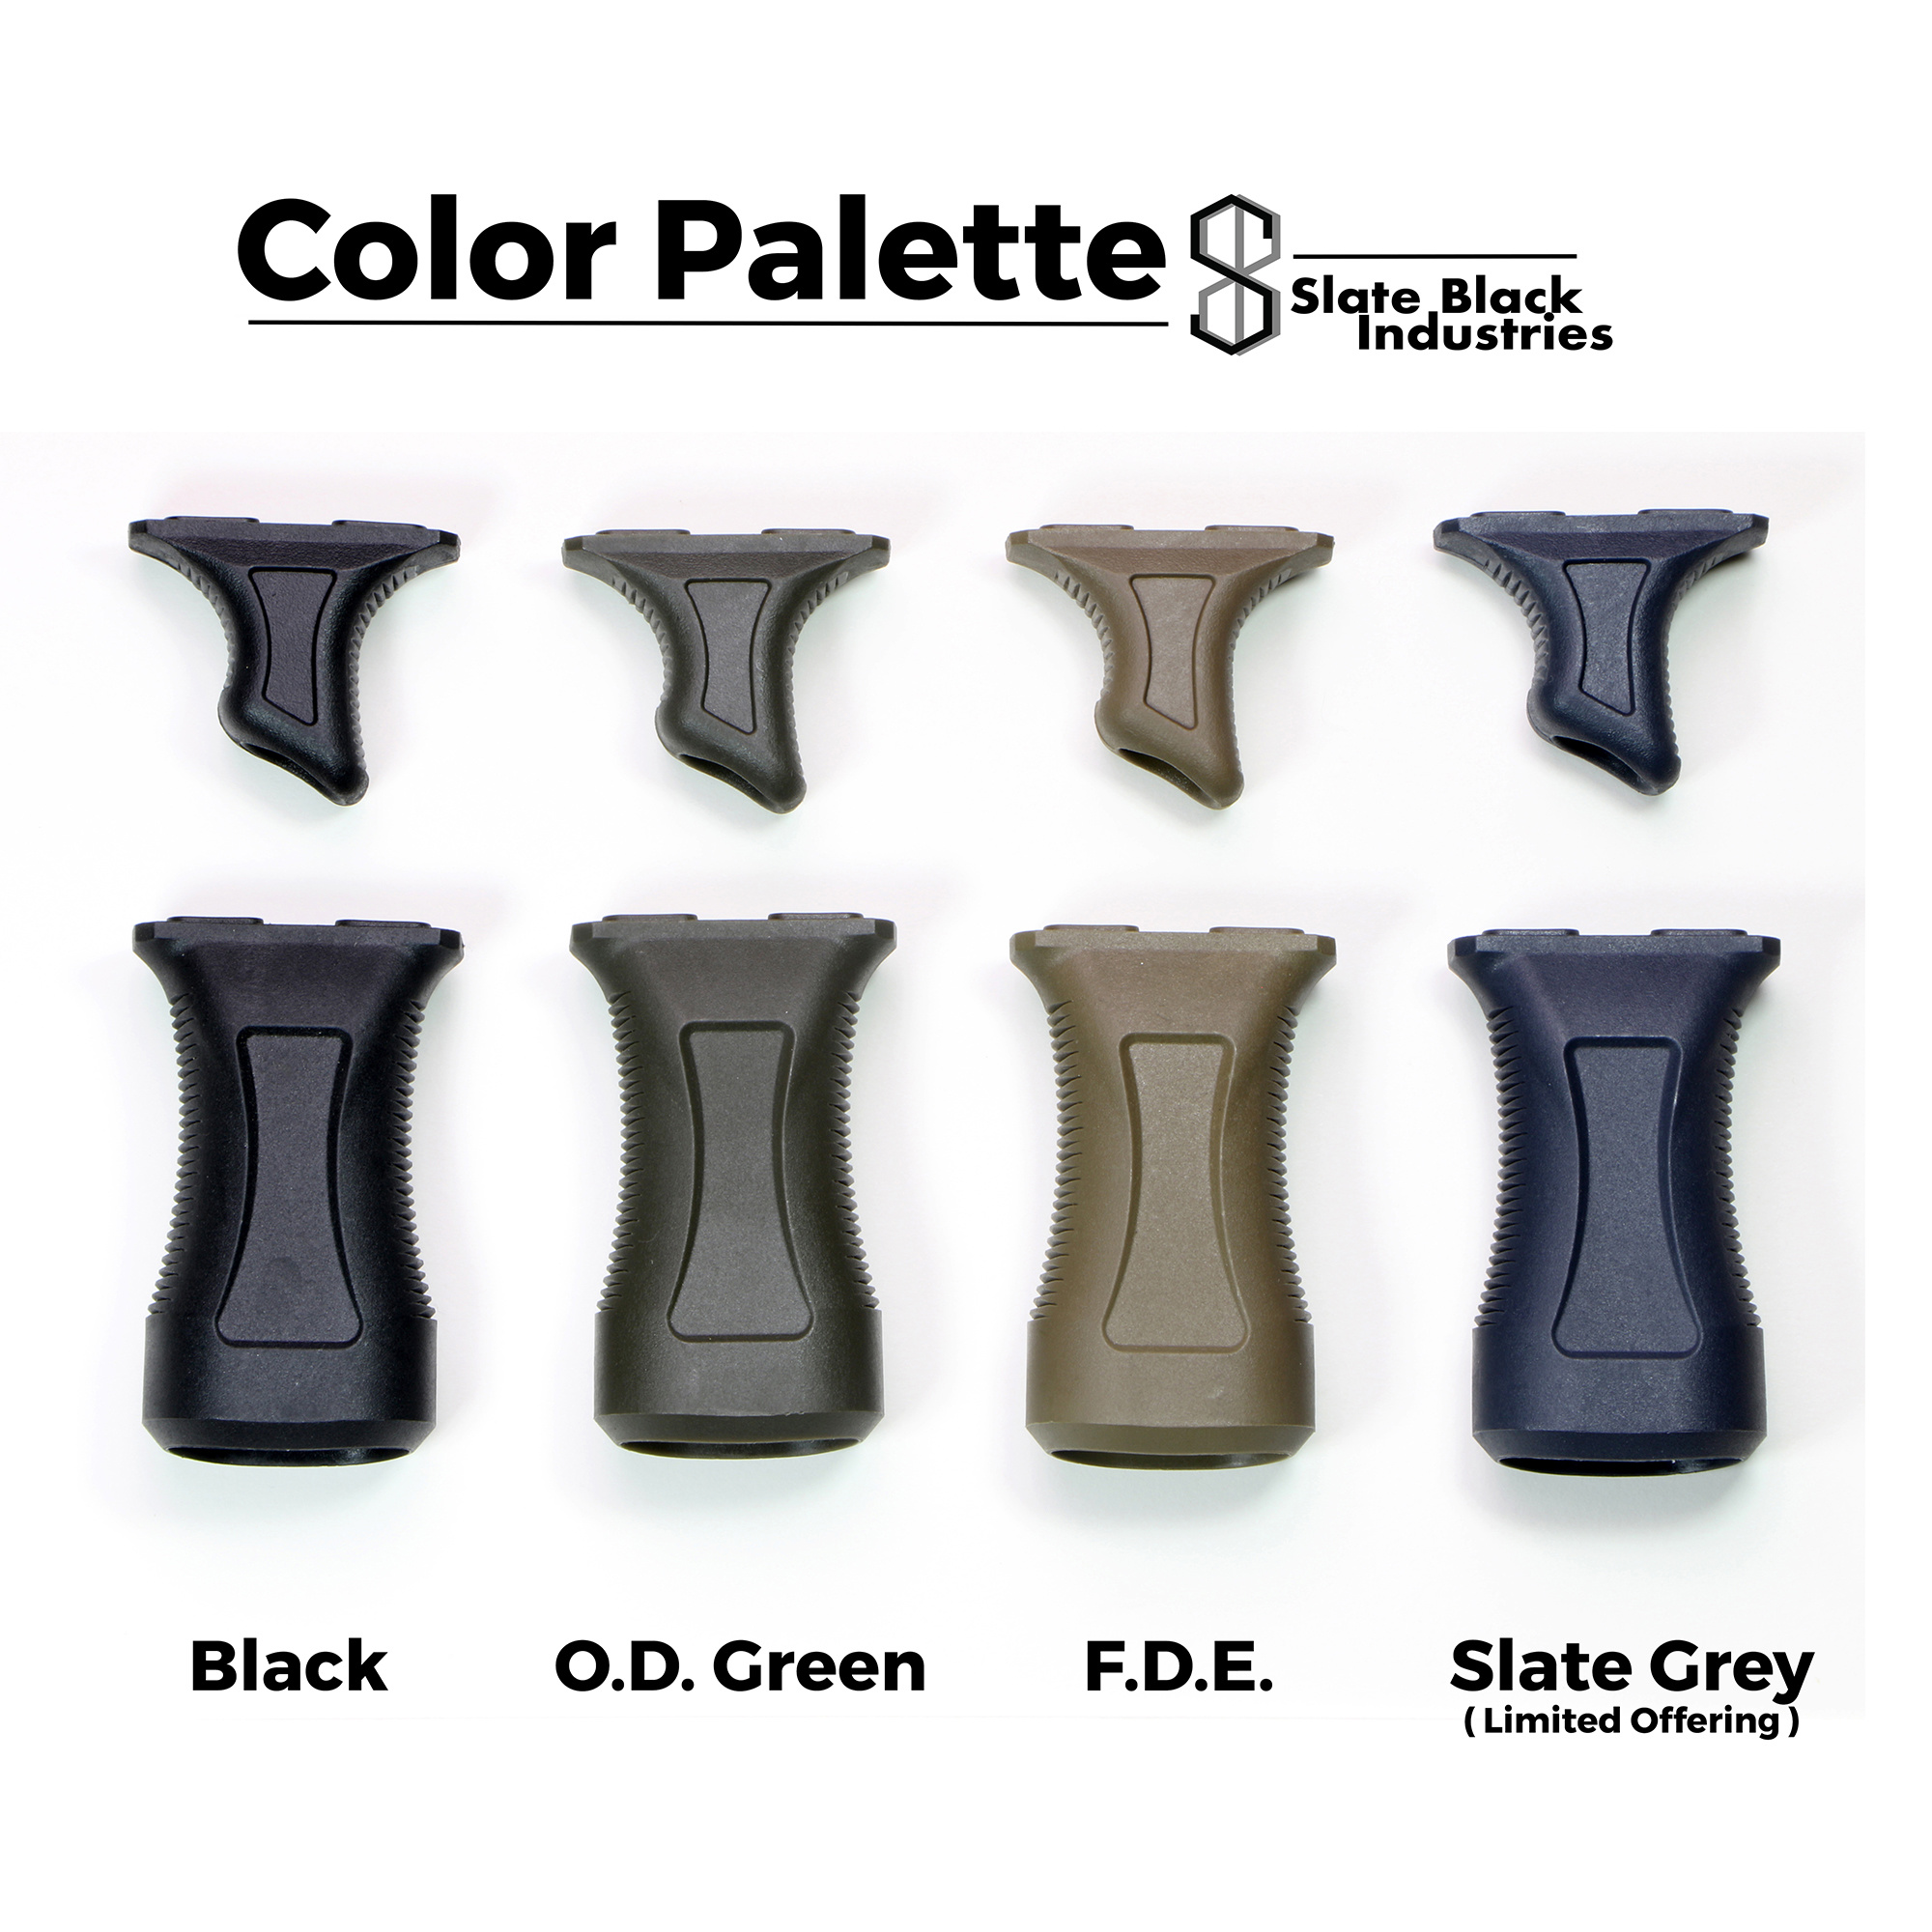 Slate Black Industries Slate Stop + Slate Grip Bundle (M-LOK)